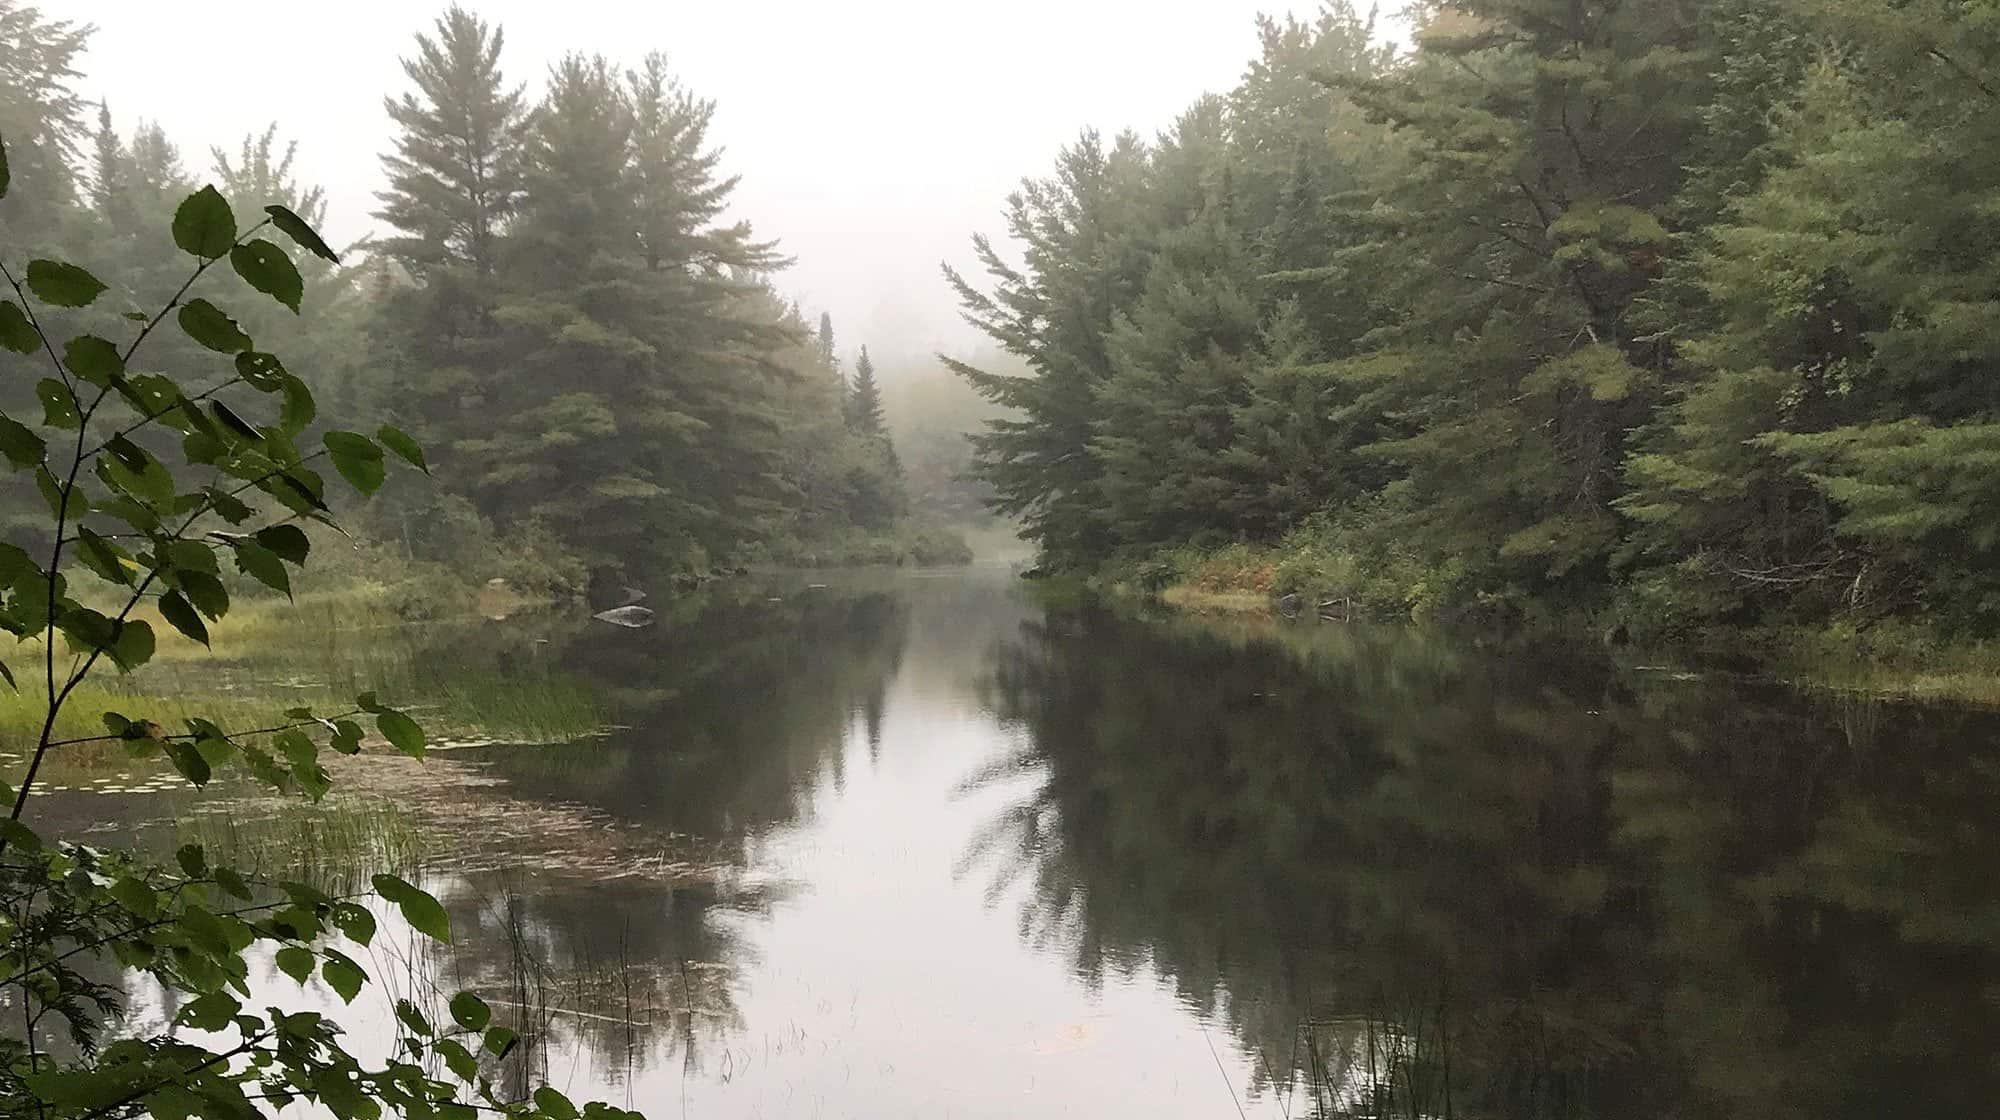 Mcht River Photo 1 2000x1120